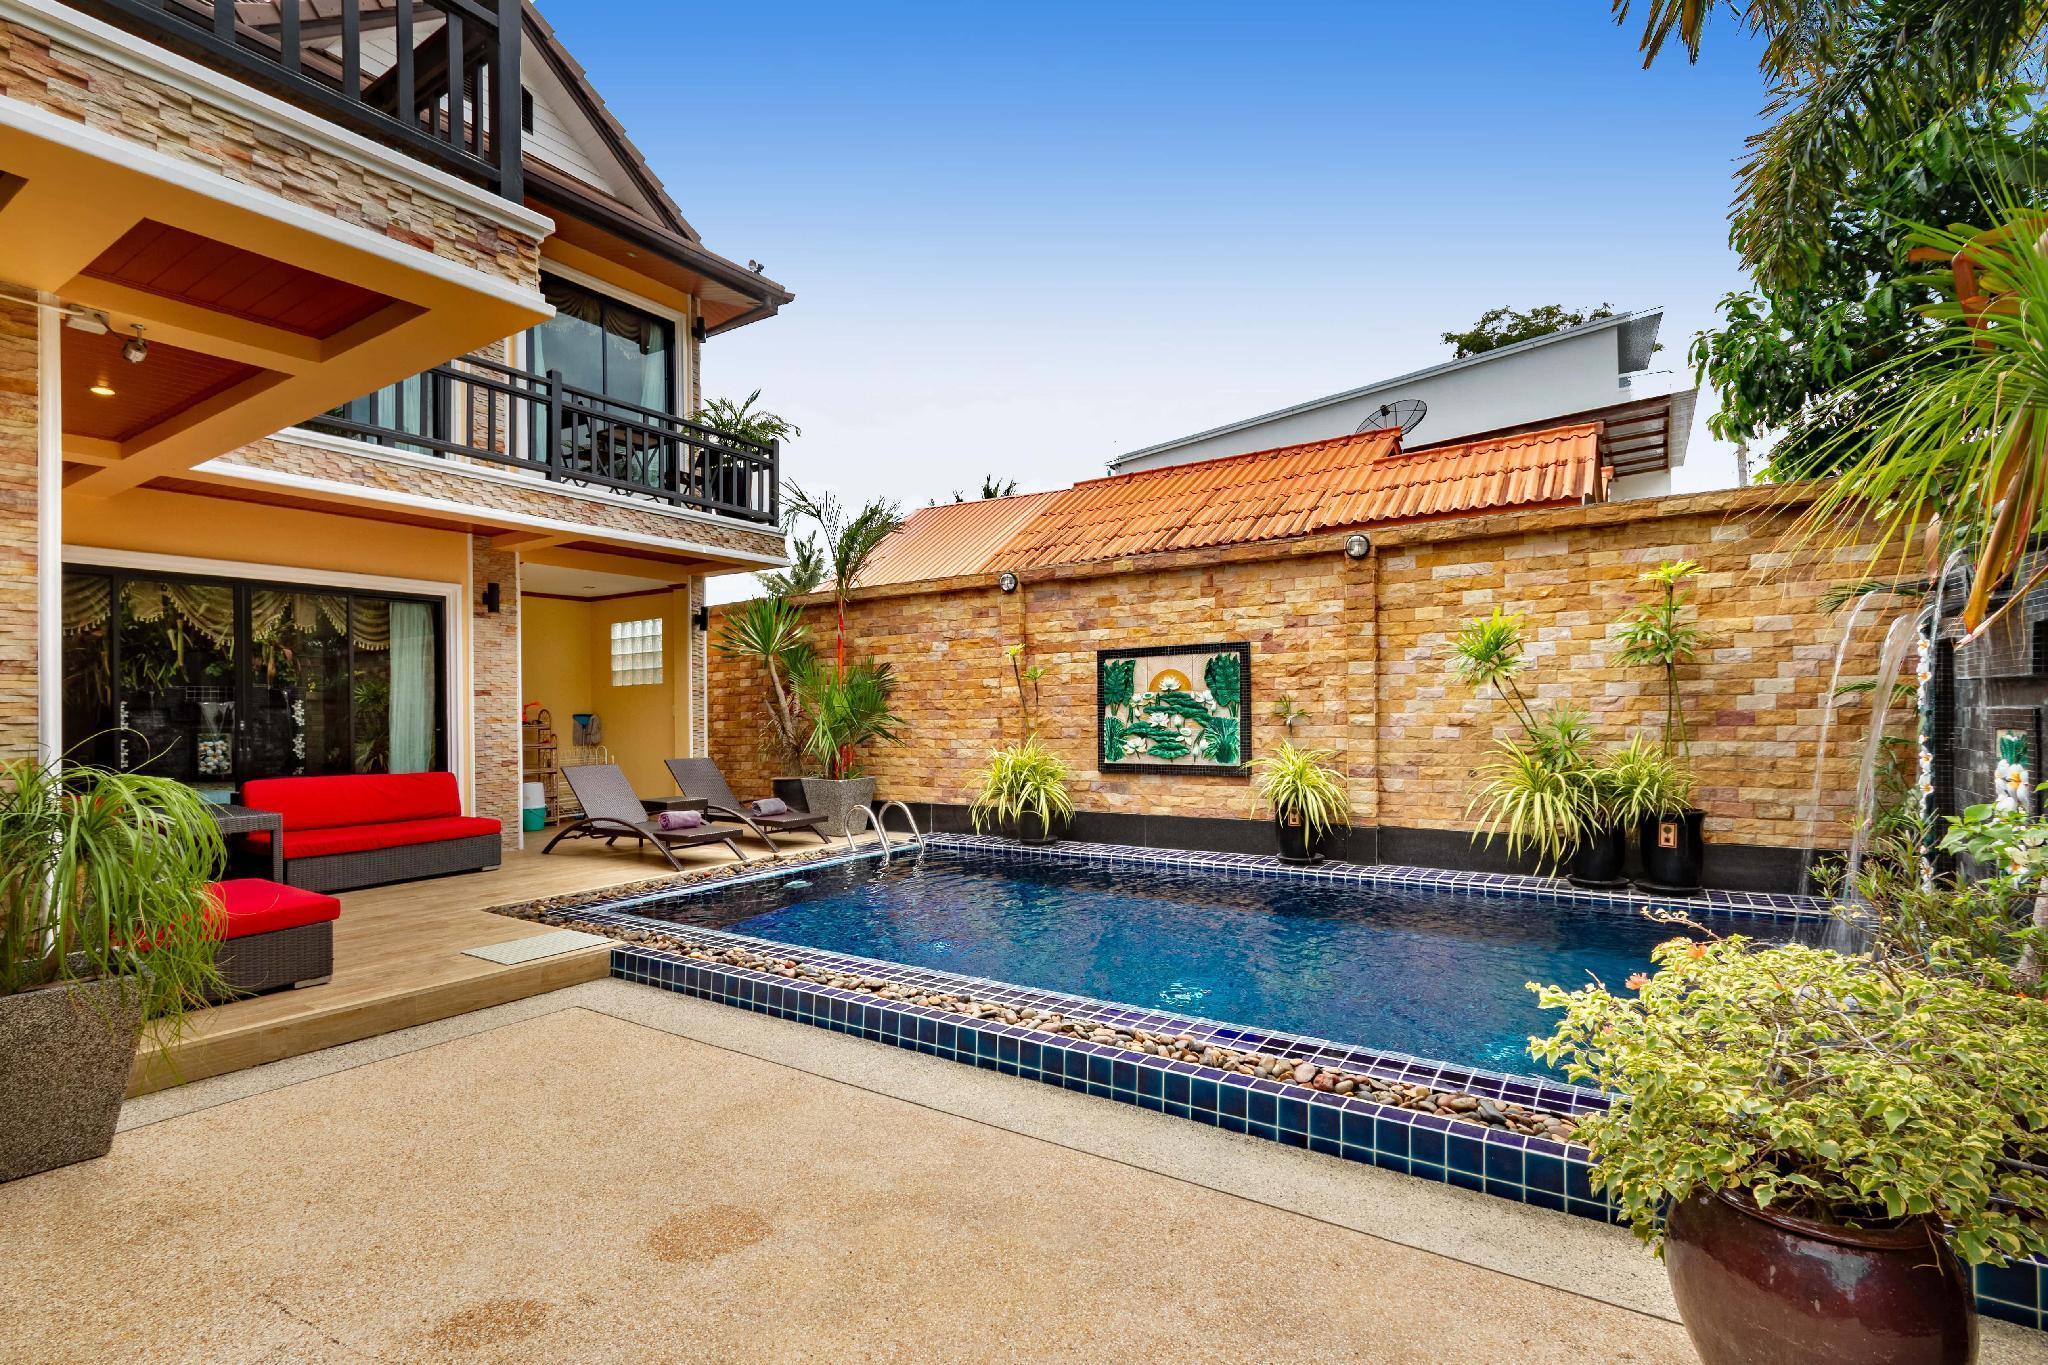 Lux villa near BangTao beach with private pool วิลลา 3 ห้องนอน 3 ห้องน้ำส่วนตัว ขนาด 250 ตร.ม. – บางเทา